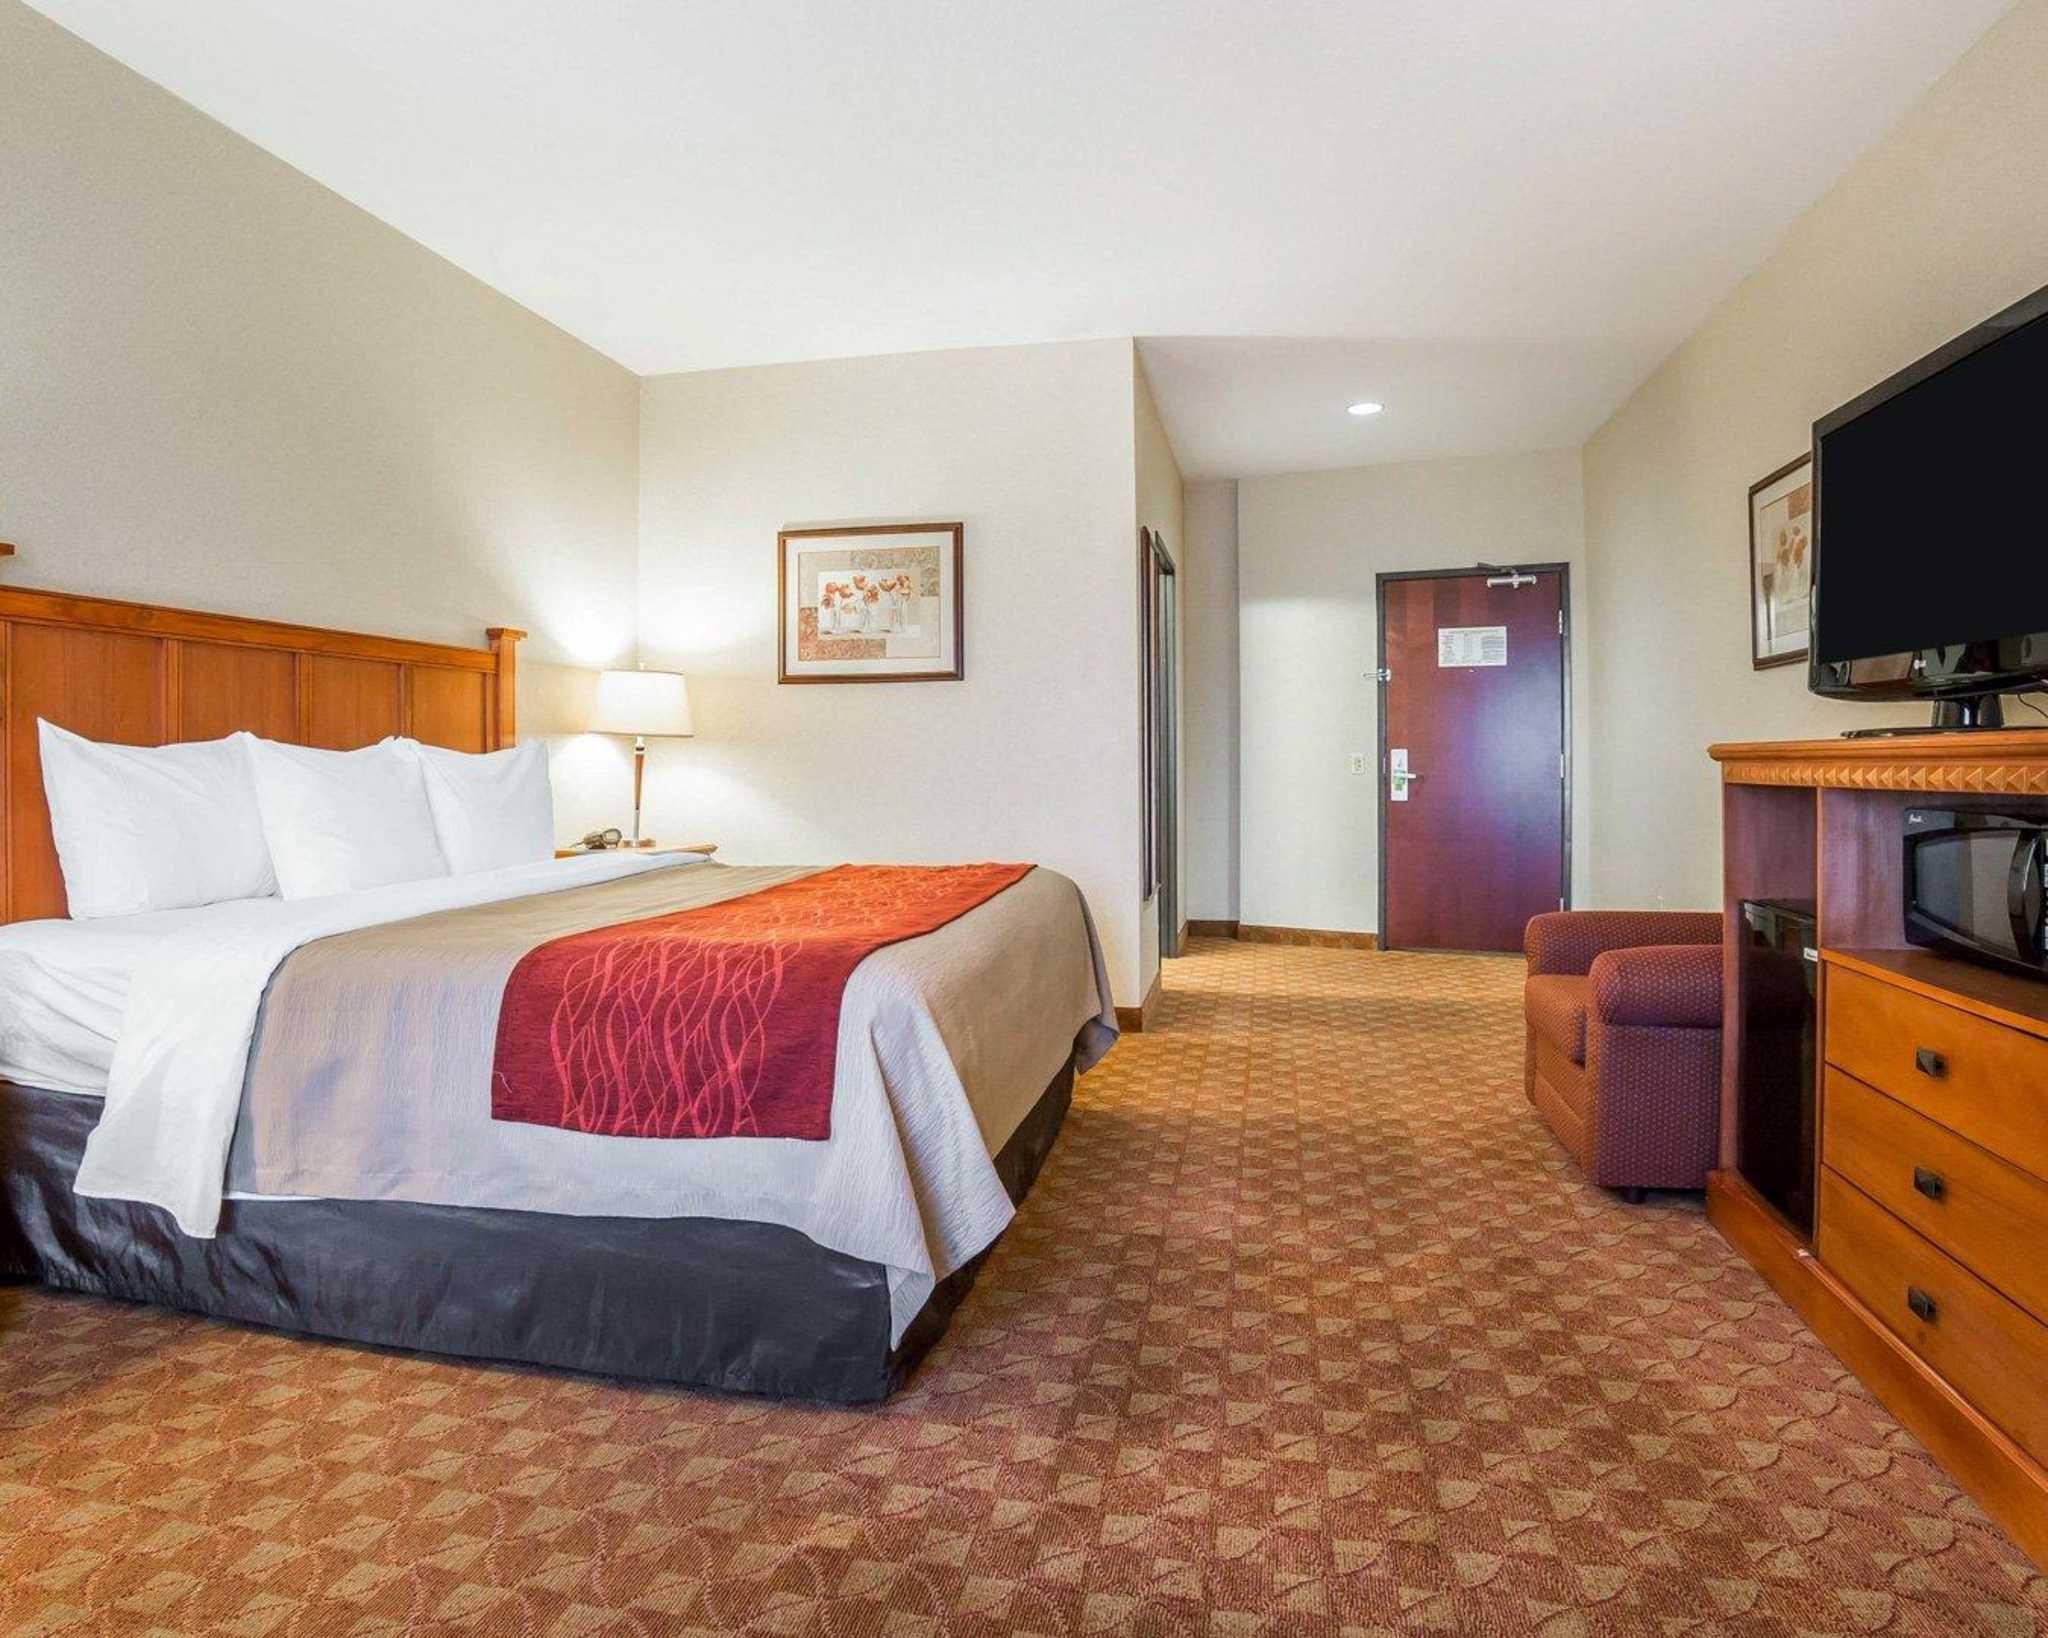 Comfort Inn & Suites Las Vegas - Nellis image 9